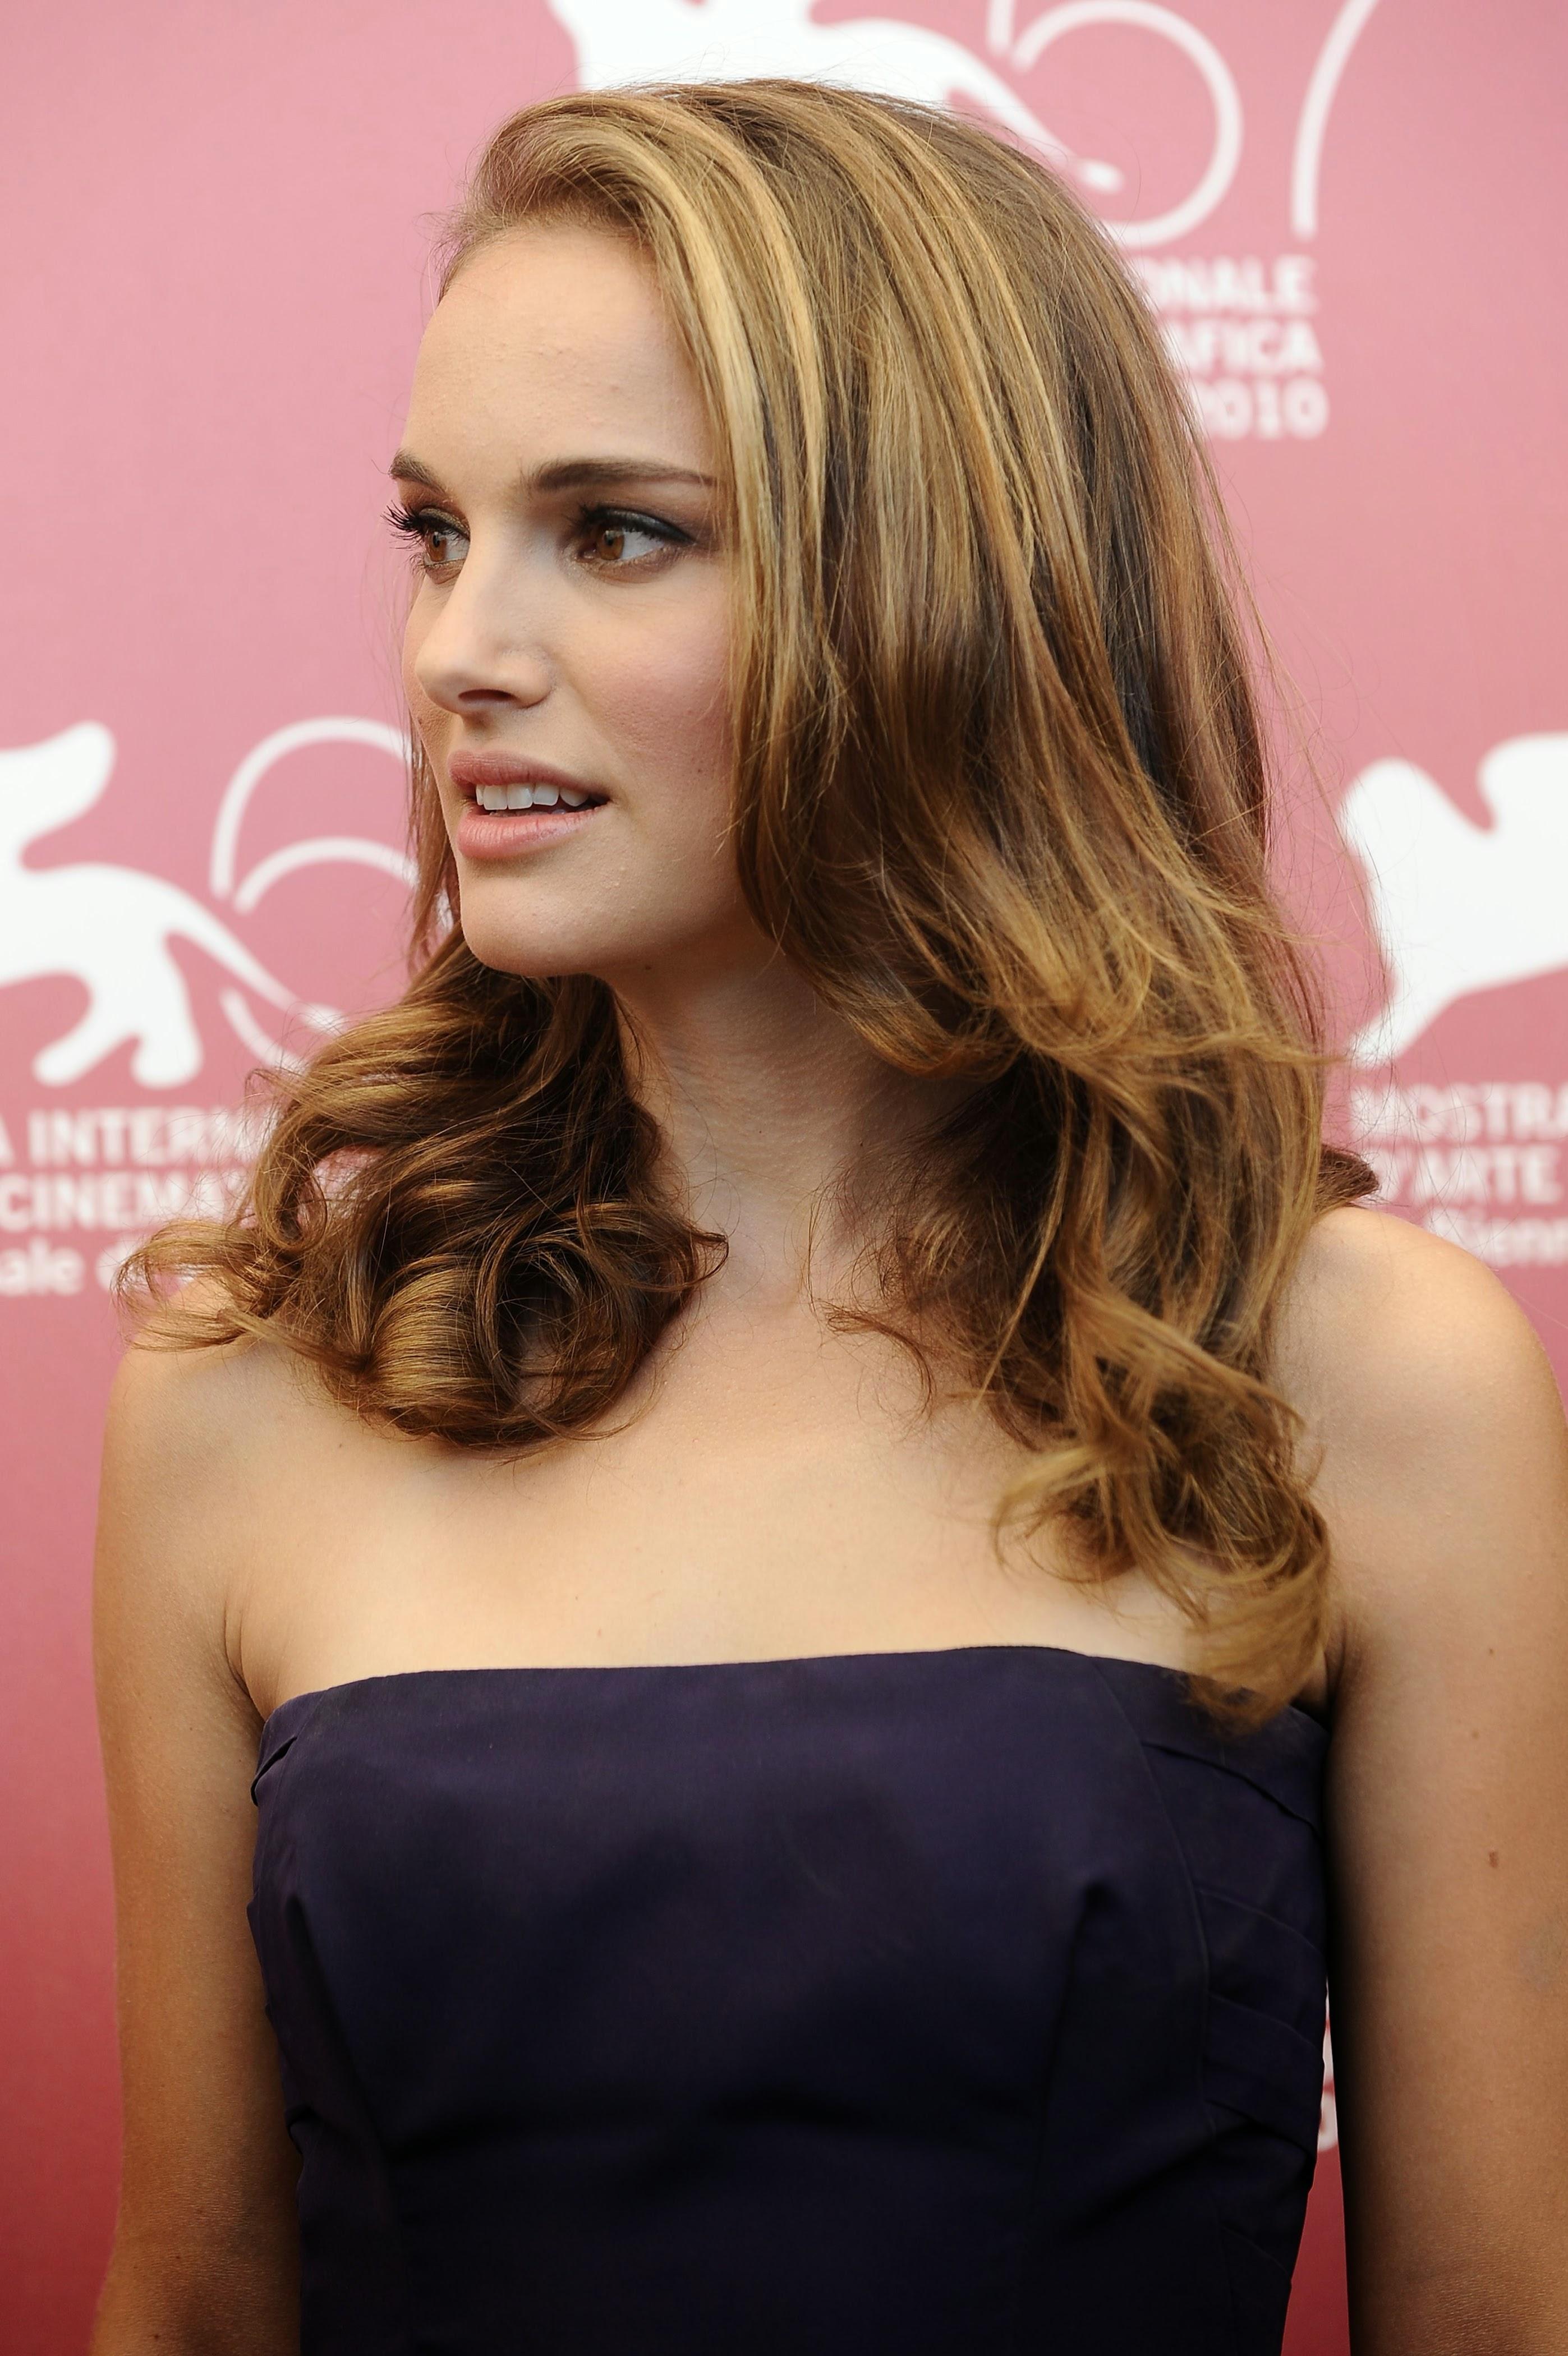 Sexy Women In The Universe: Natalie Portman